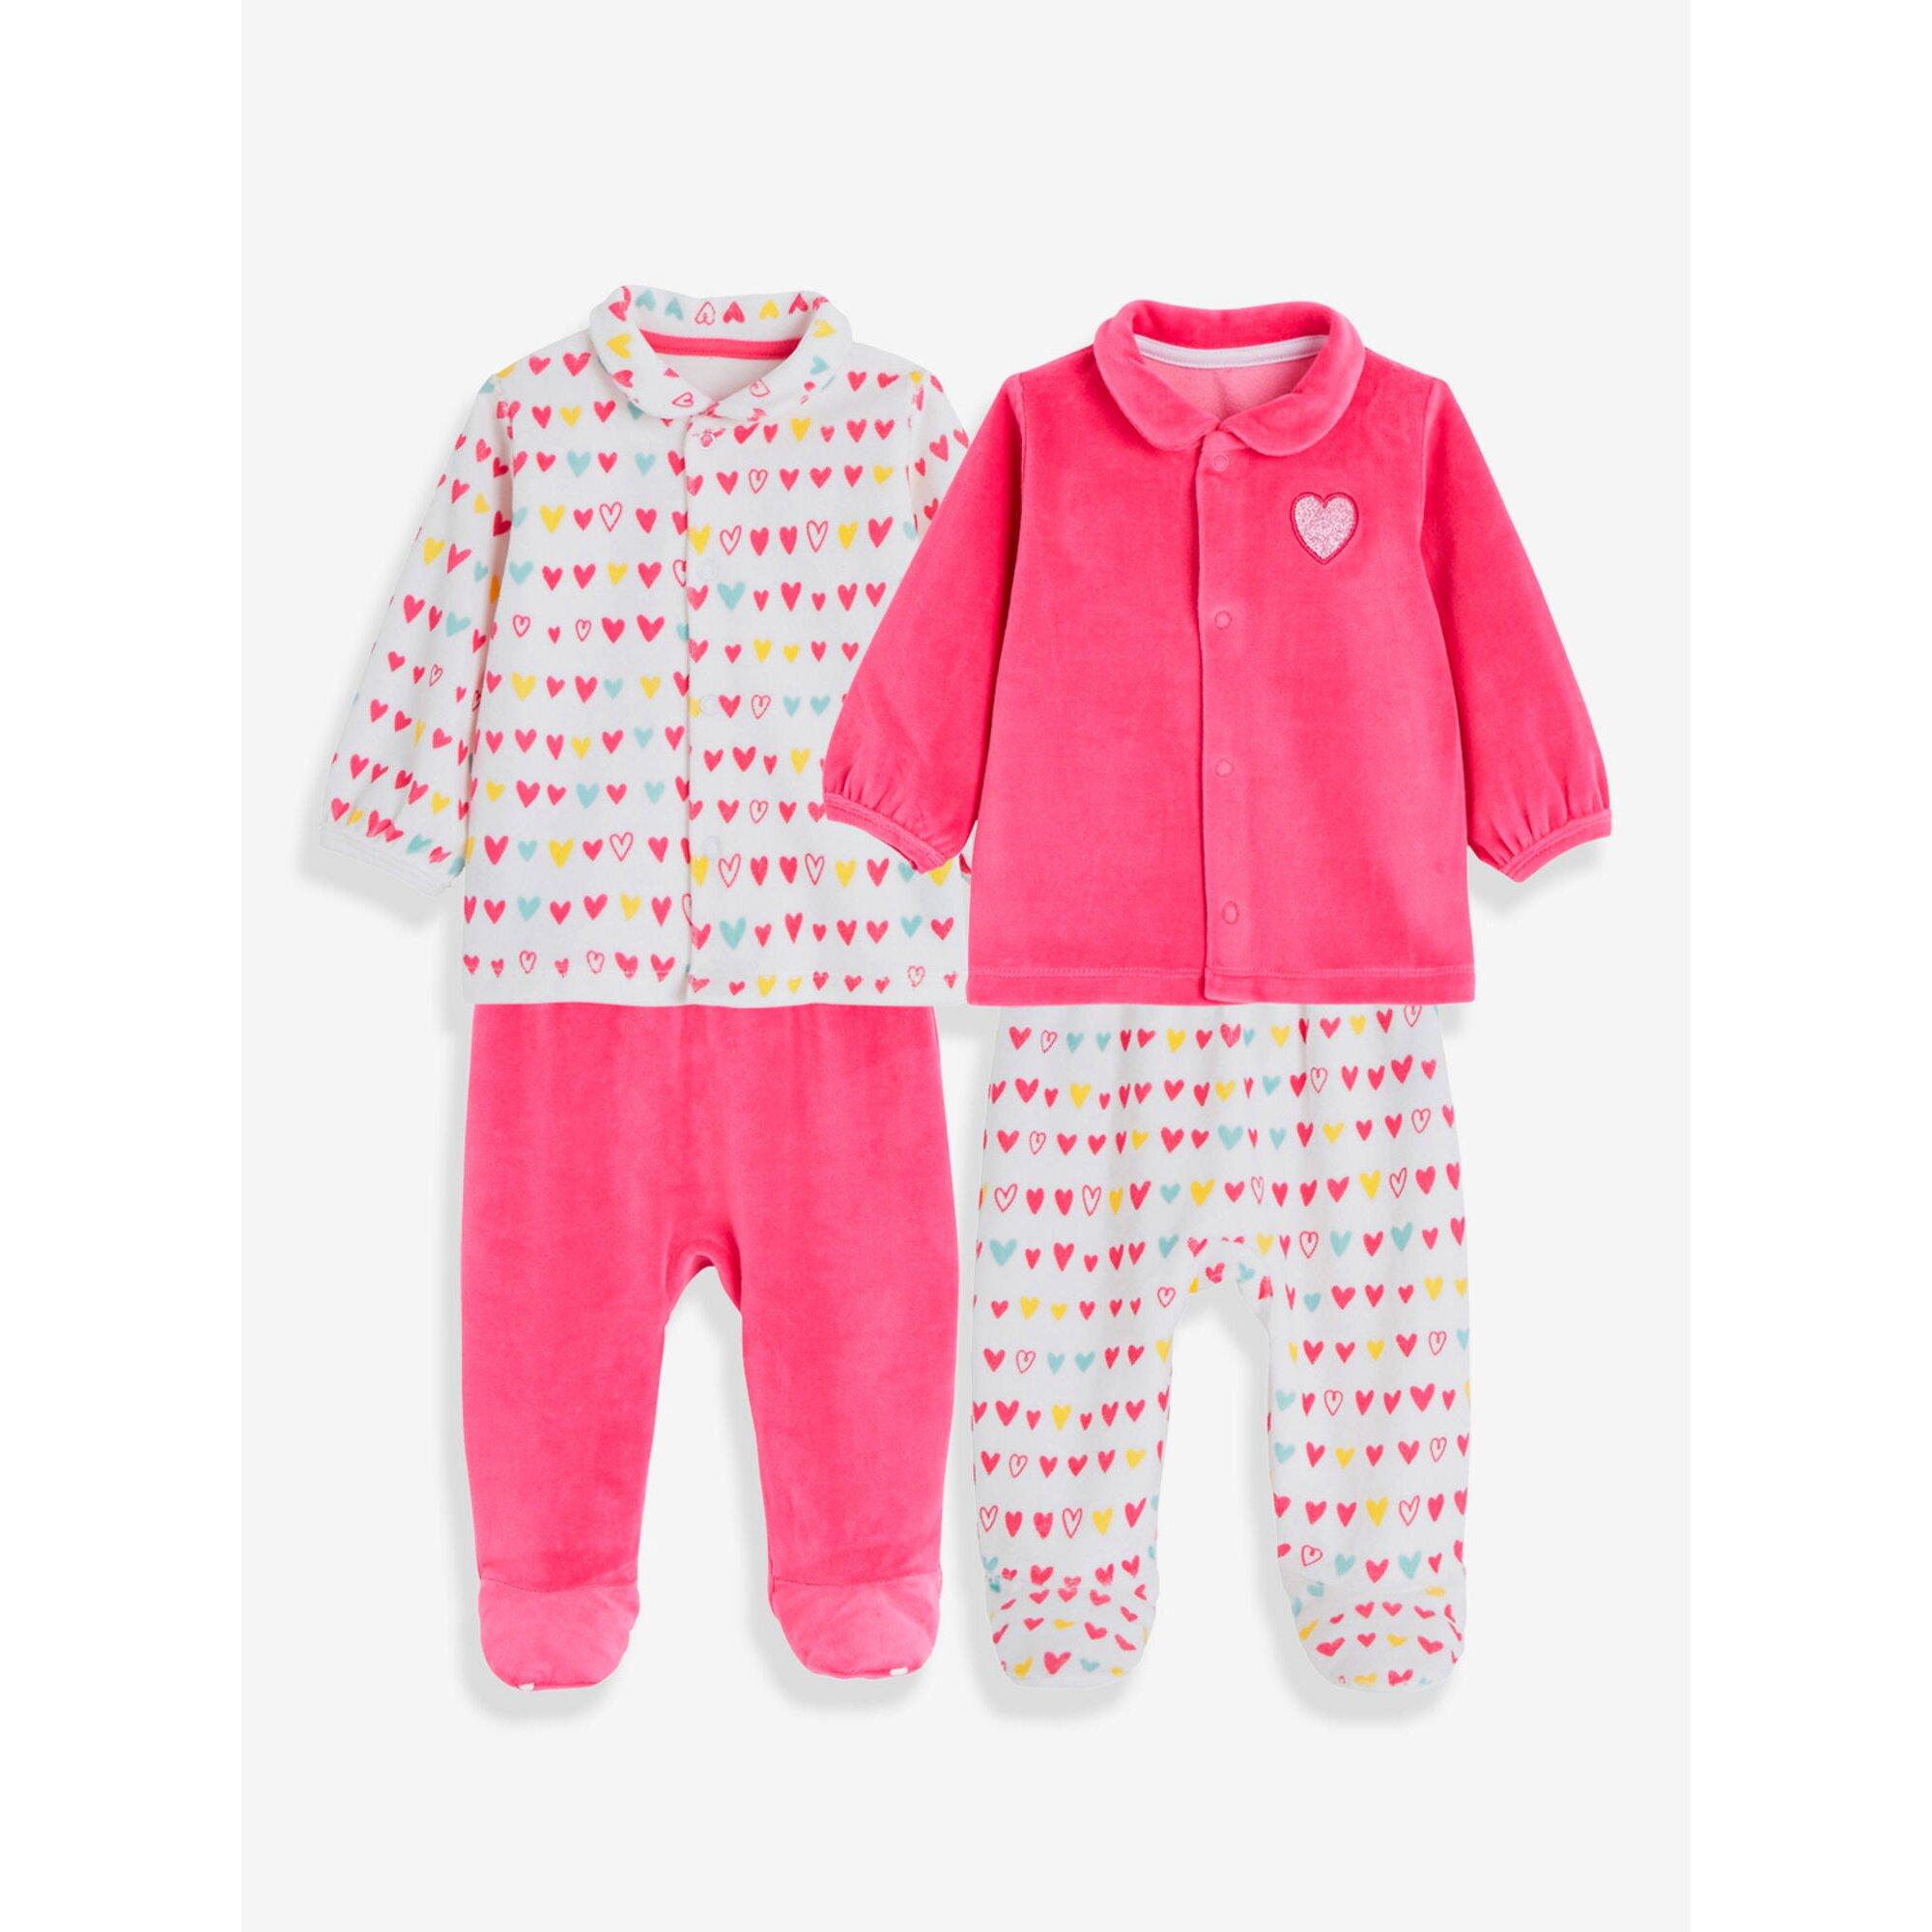 vertbaudet-2er-pack-baby-pyjamas-aus-samt